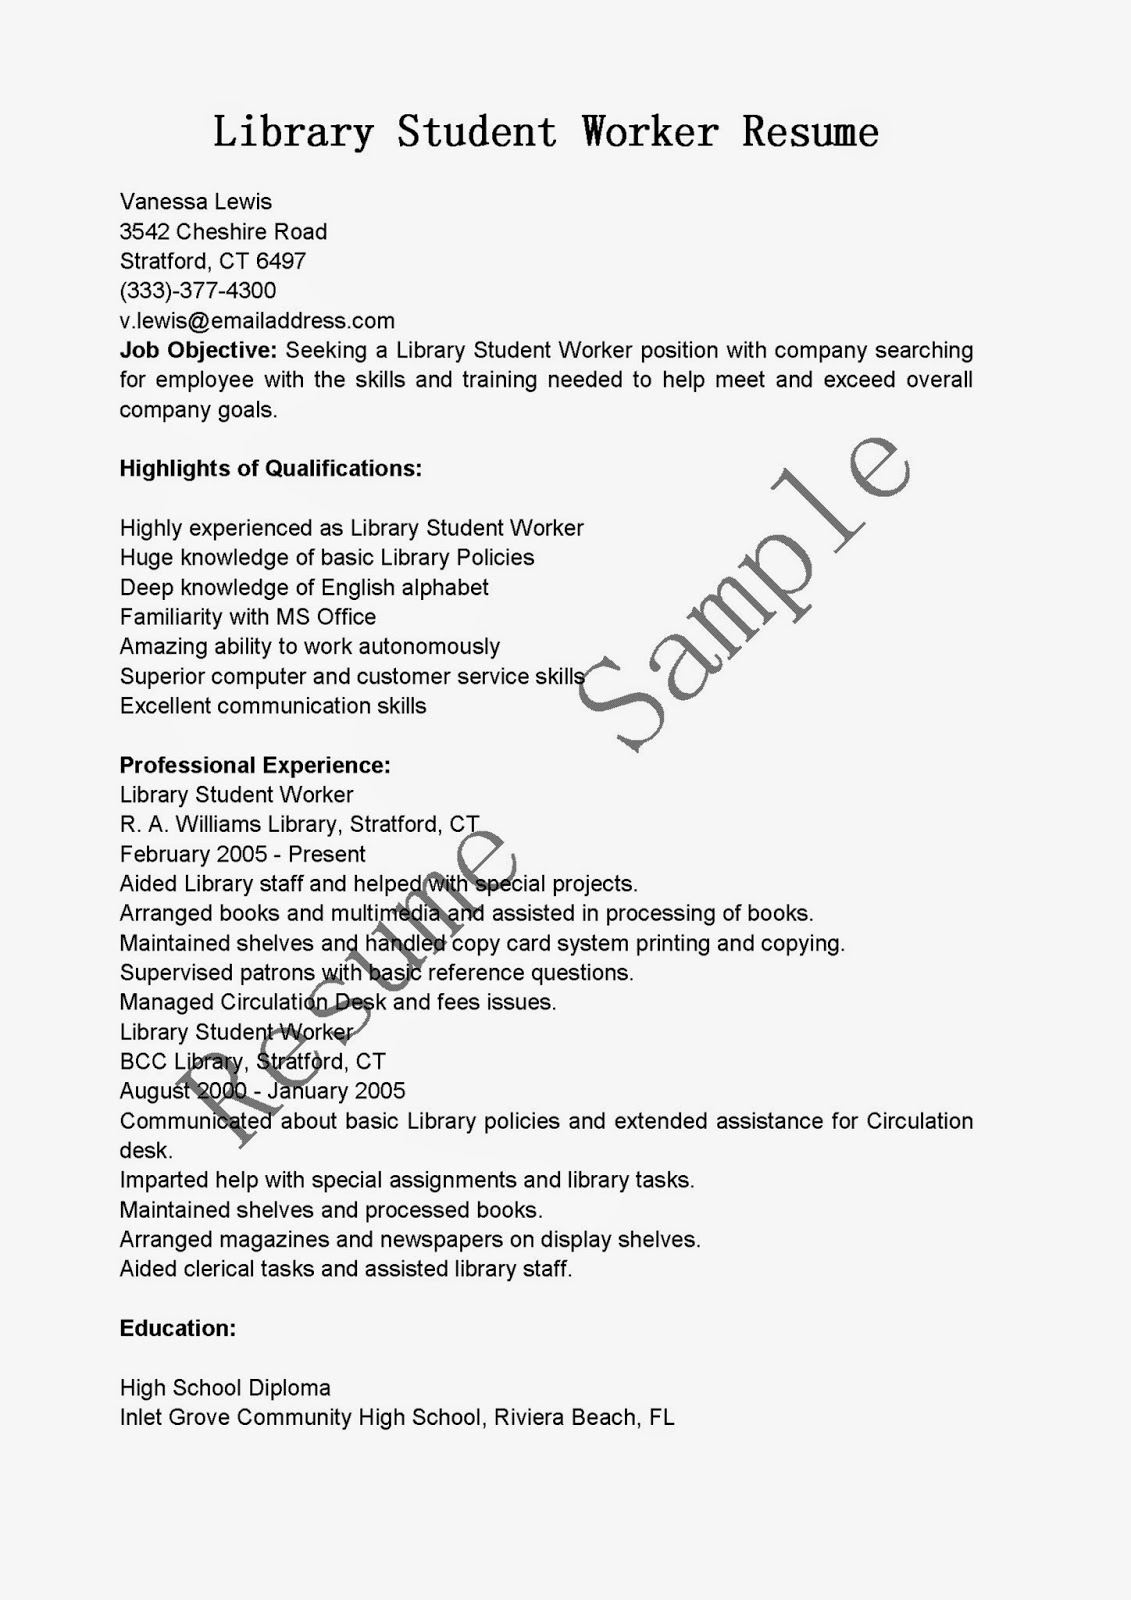 Resume Samples Library Student Worker Resume Sample